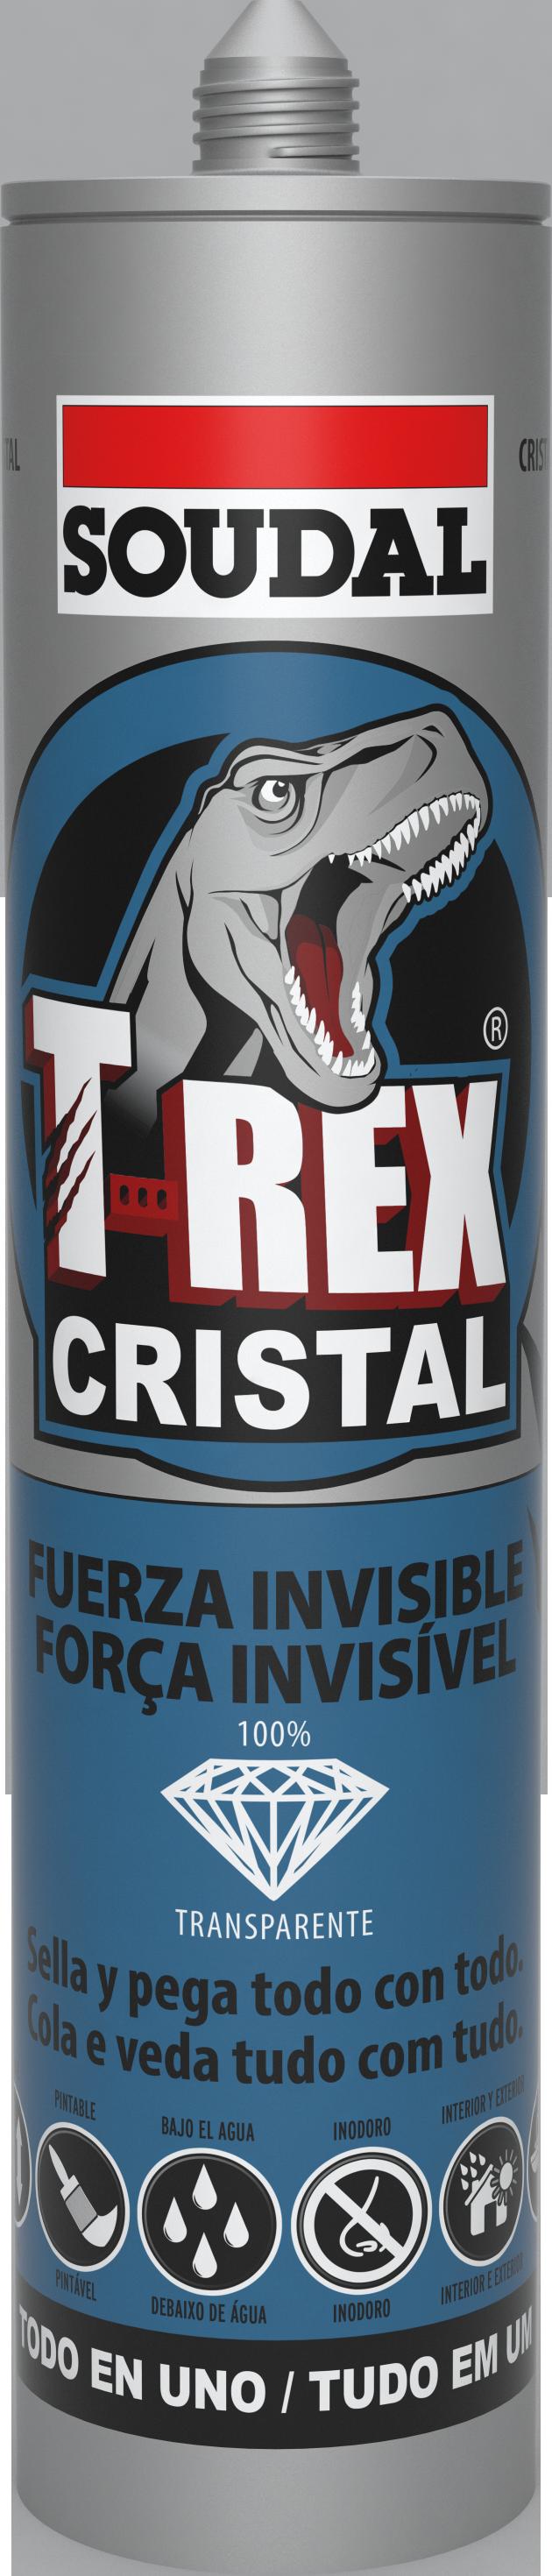 T-Rex Cristal